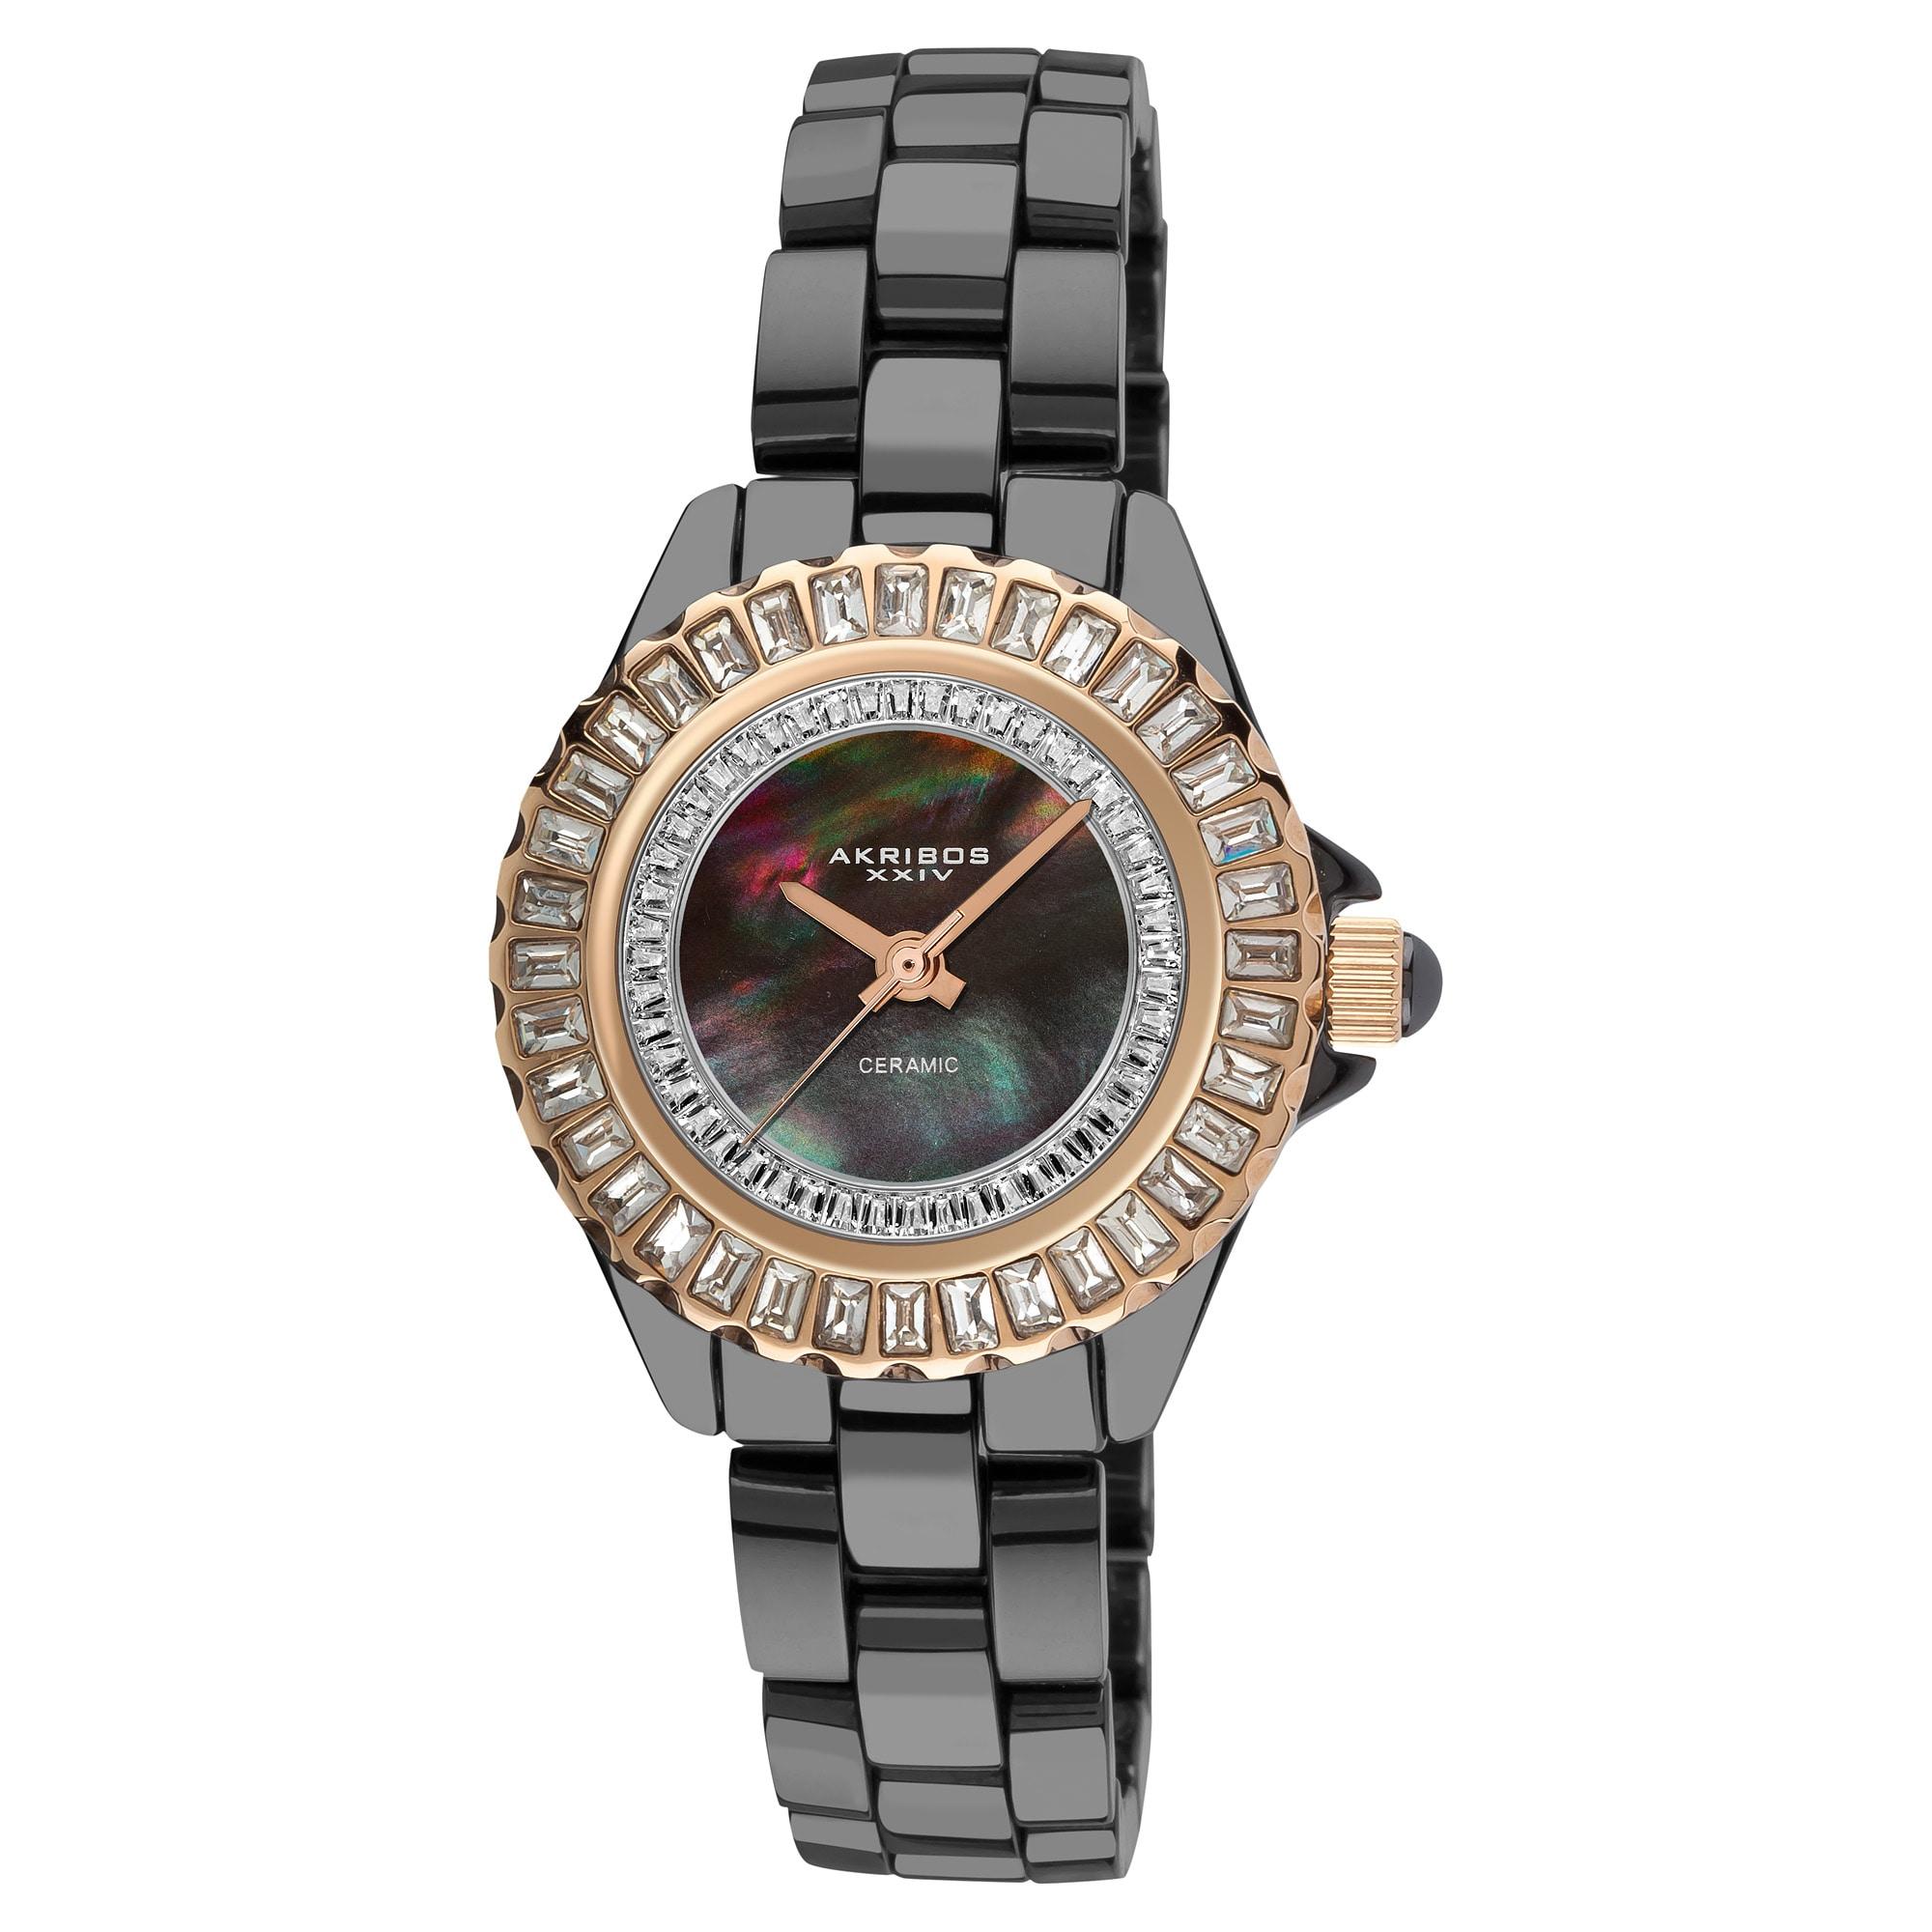 Akribos XXIV Women's Quartz Baguette Ceramic Bracelet Watch